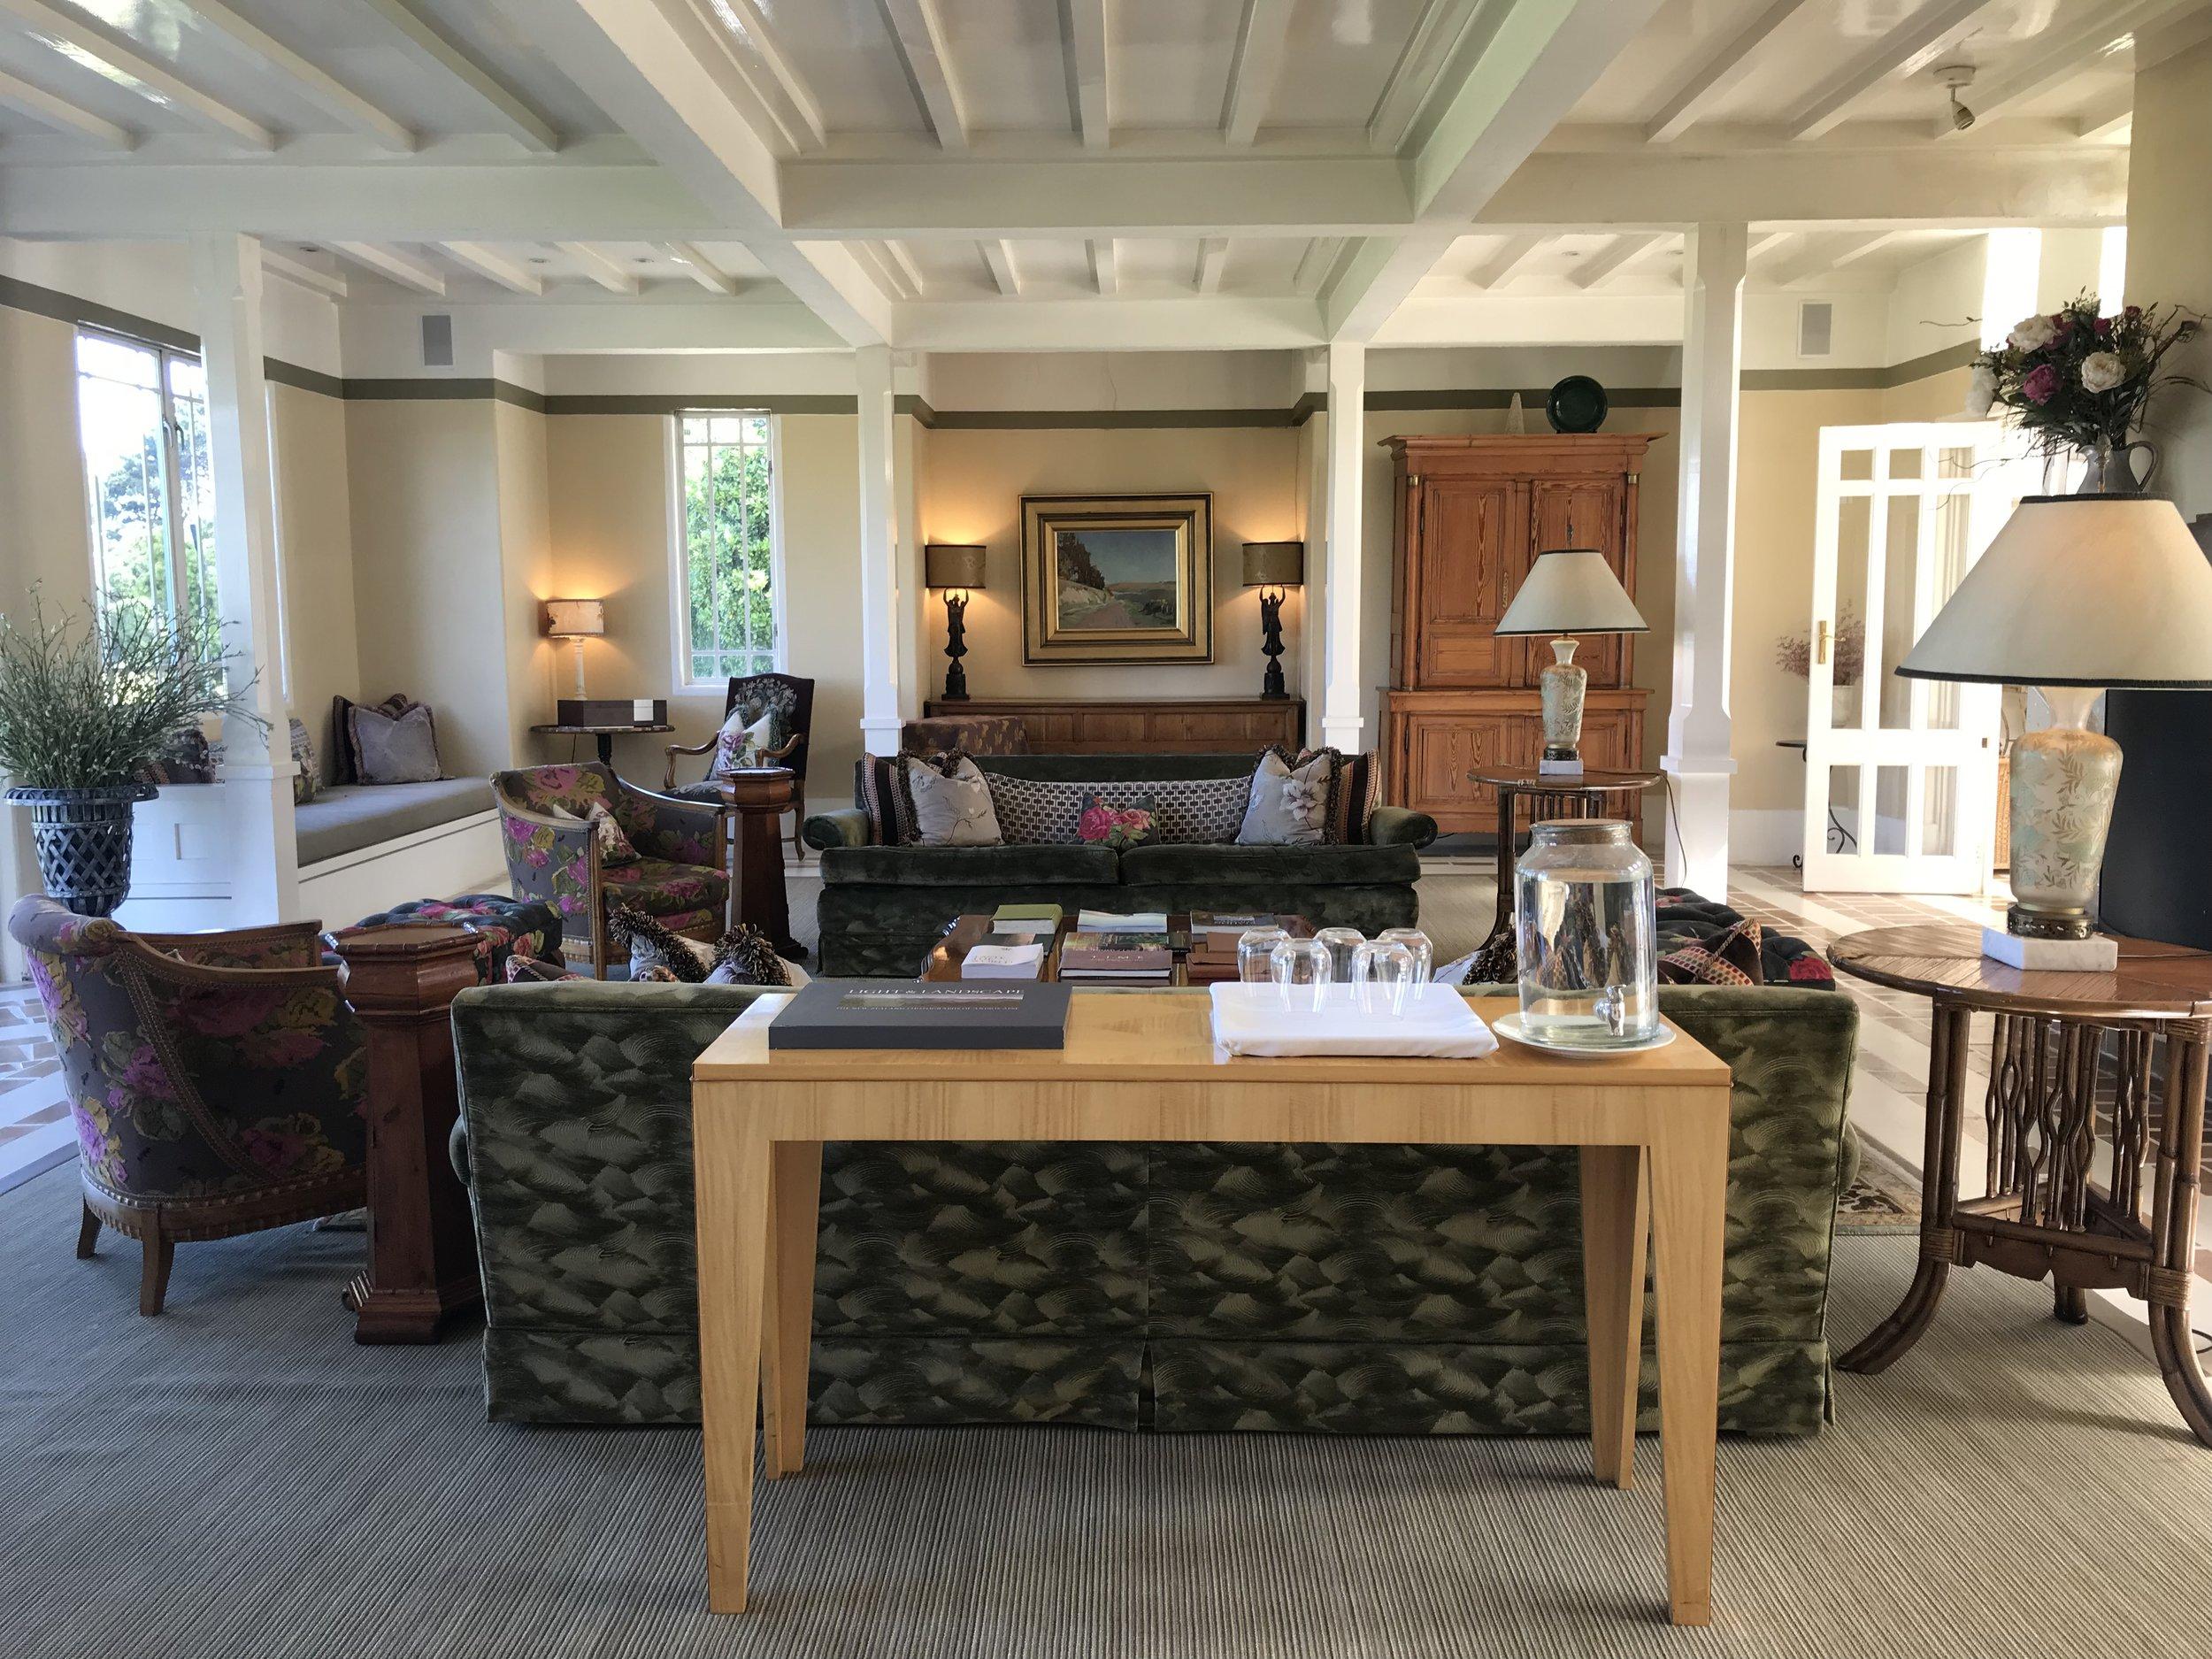 Wharekauhau lounge (image by Jacqui Gibson).